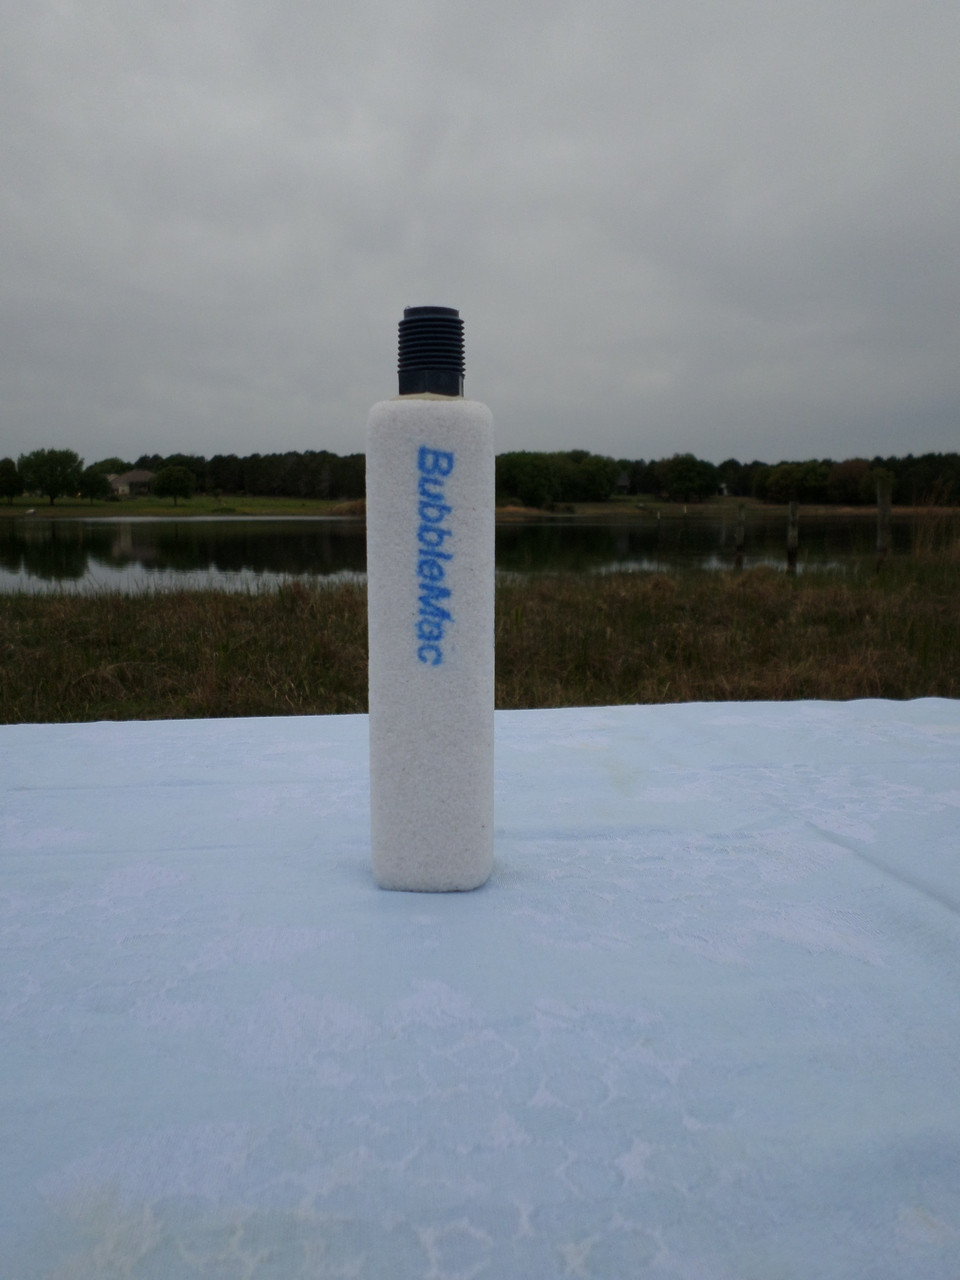 Fine pore air diffuser 1 5 x 1 5 x 6 w 1 2 npt pe for Bubblemac air diffusers